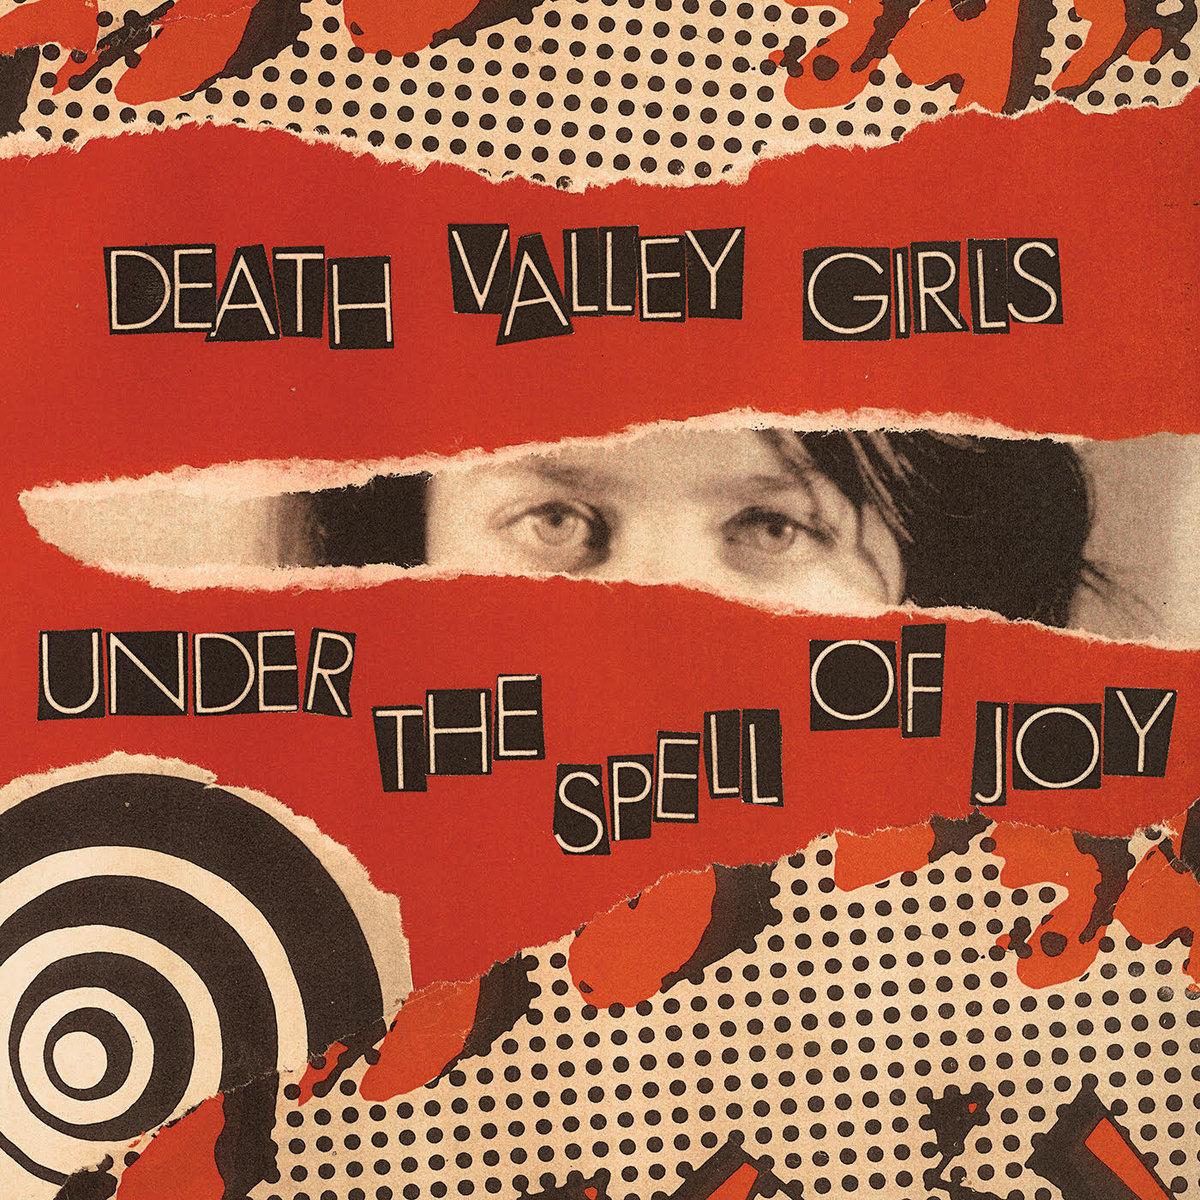 Death Valley Girls - Under the Spell of Joy